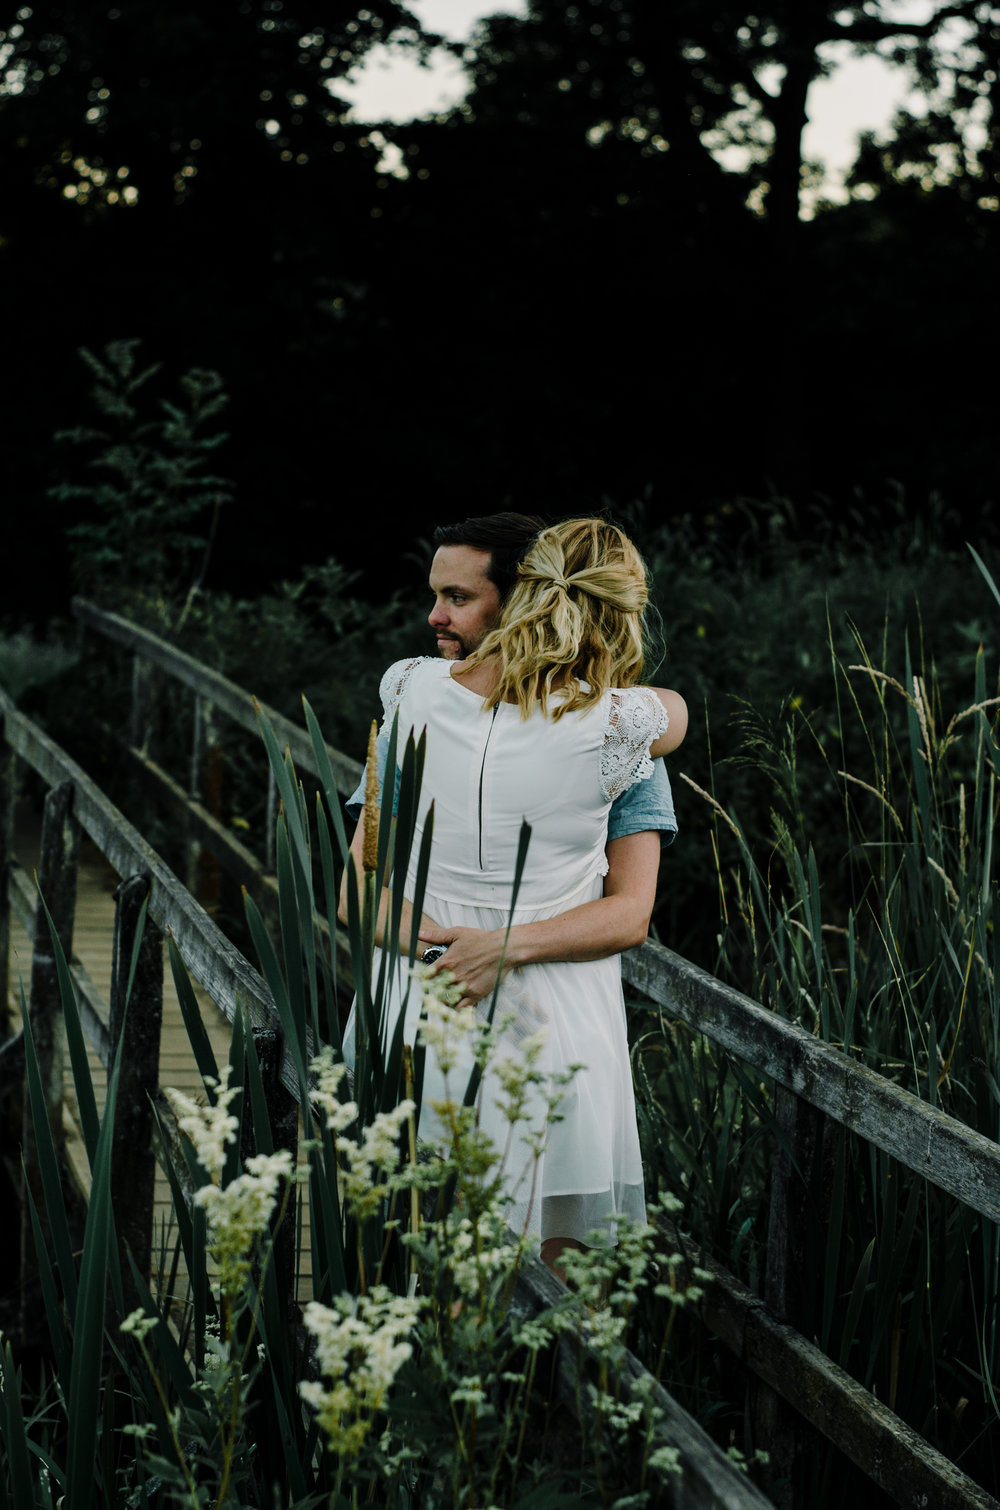 Gina & Chris - Barcombe Mills - Couple Session - Aiste Saulyte Photography-84.jpg